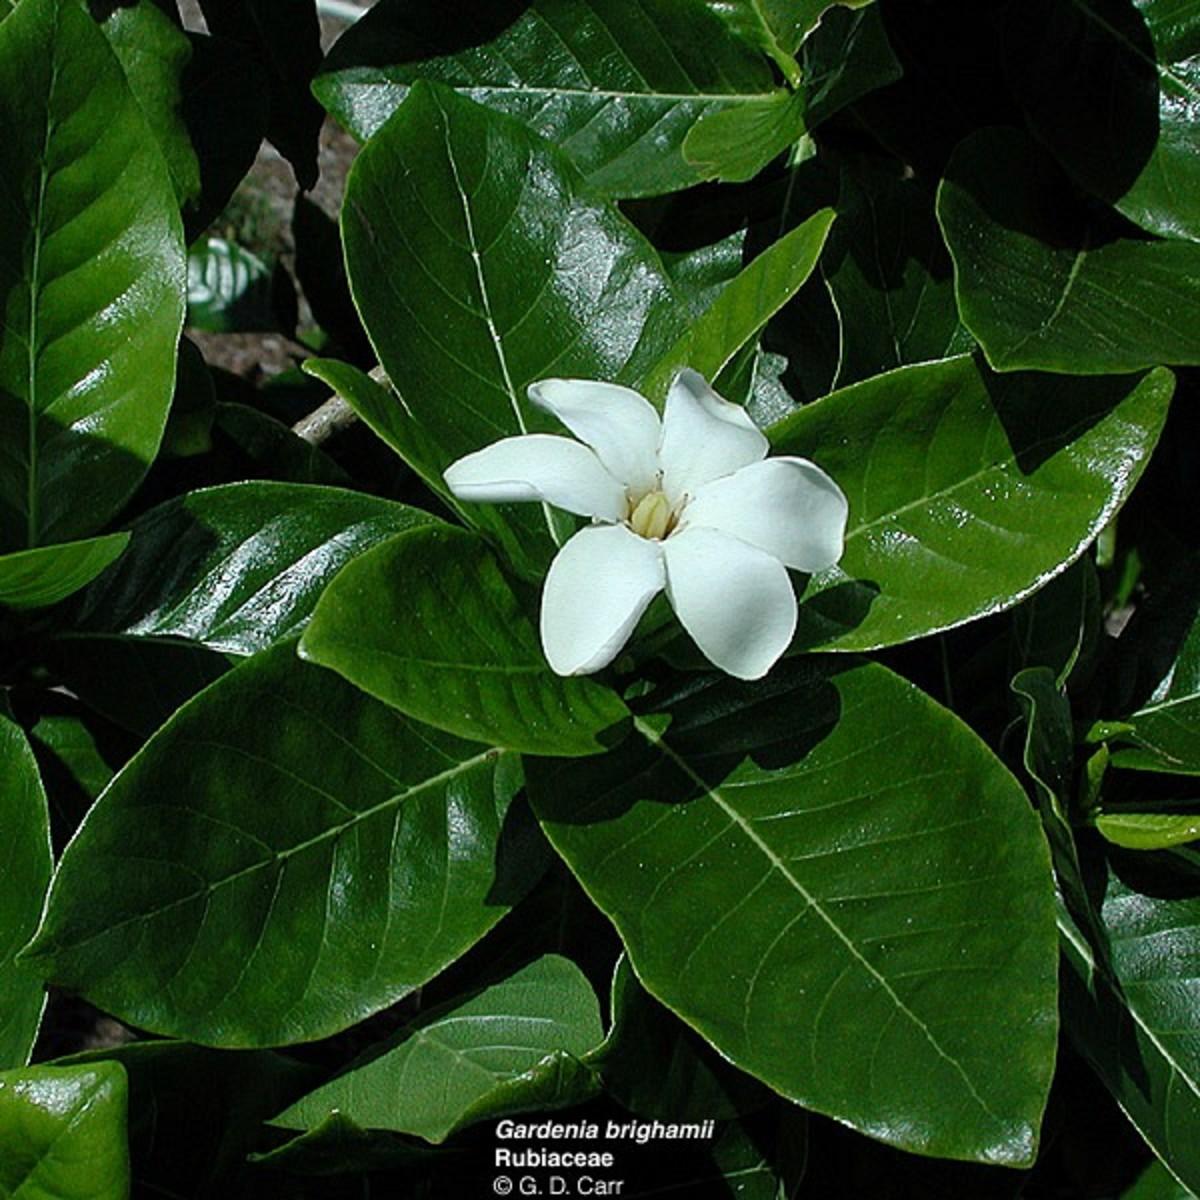 True Hawaiian Gardenia (Gardenia Brighami) - Nanu or Na'u